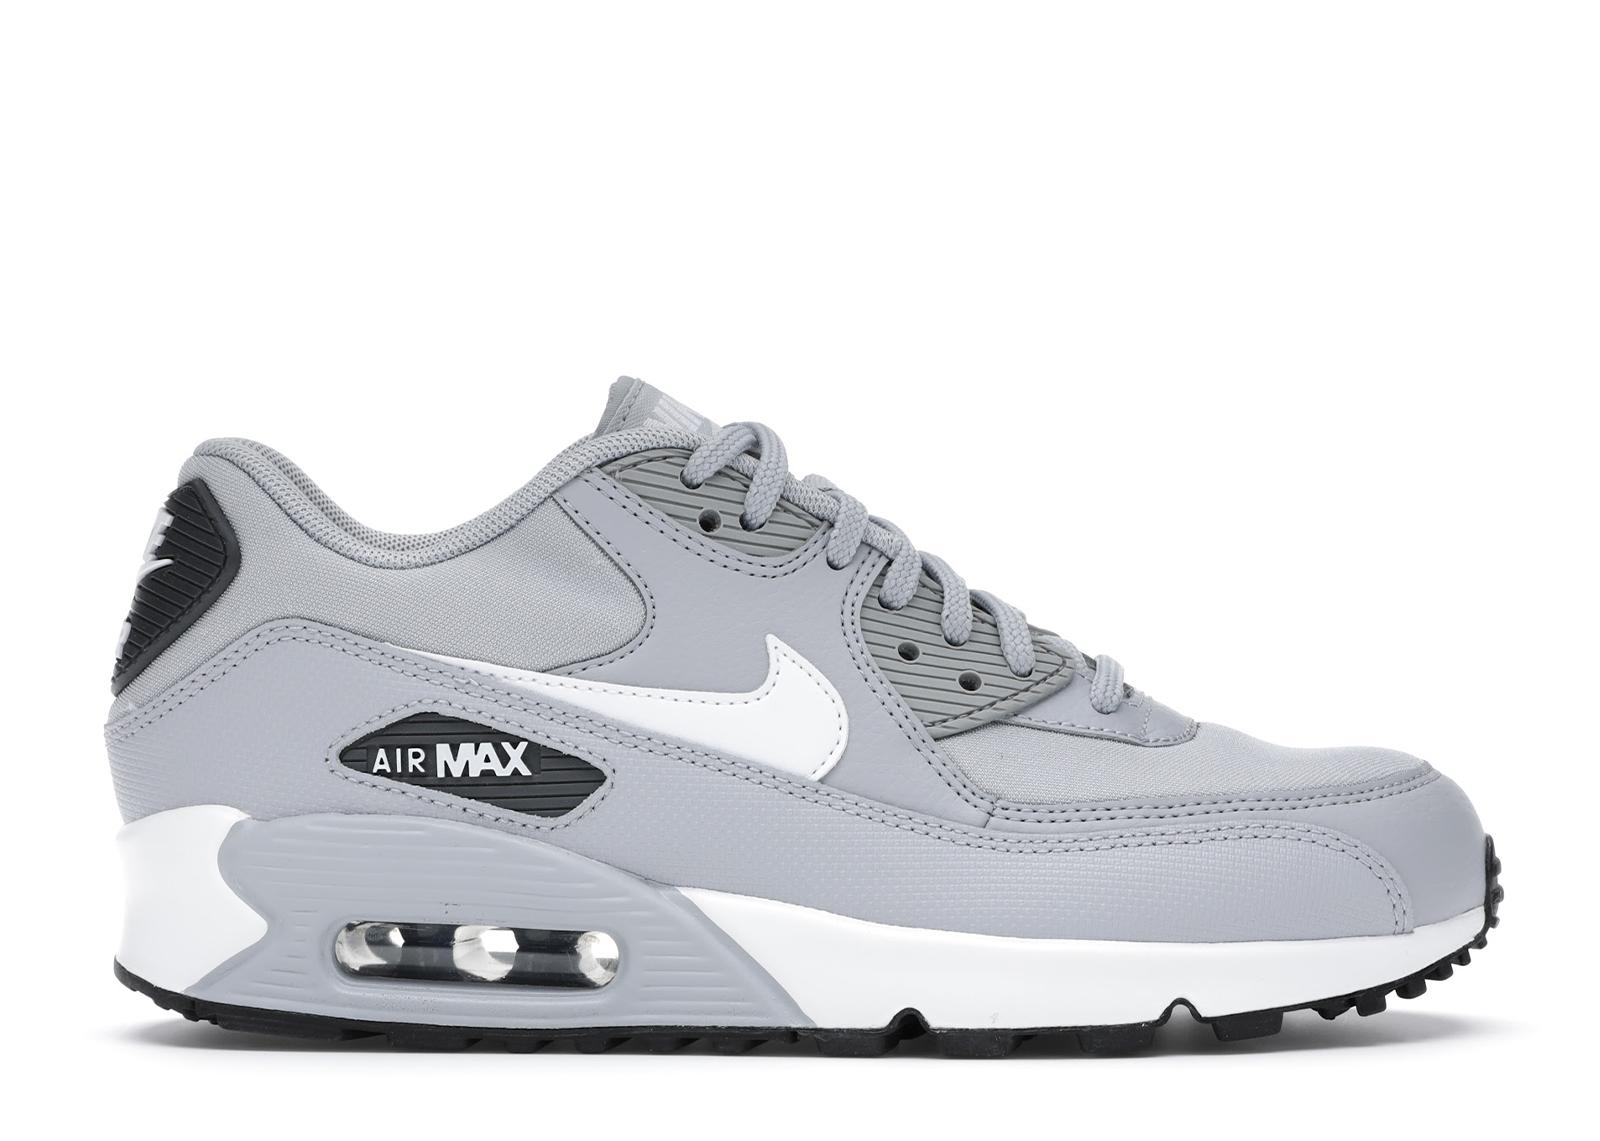 Nike Air Max 90 Wolf Grey White Black (W)